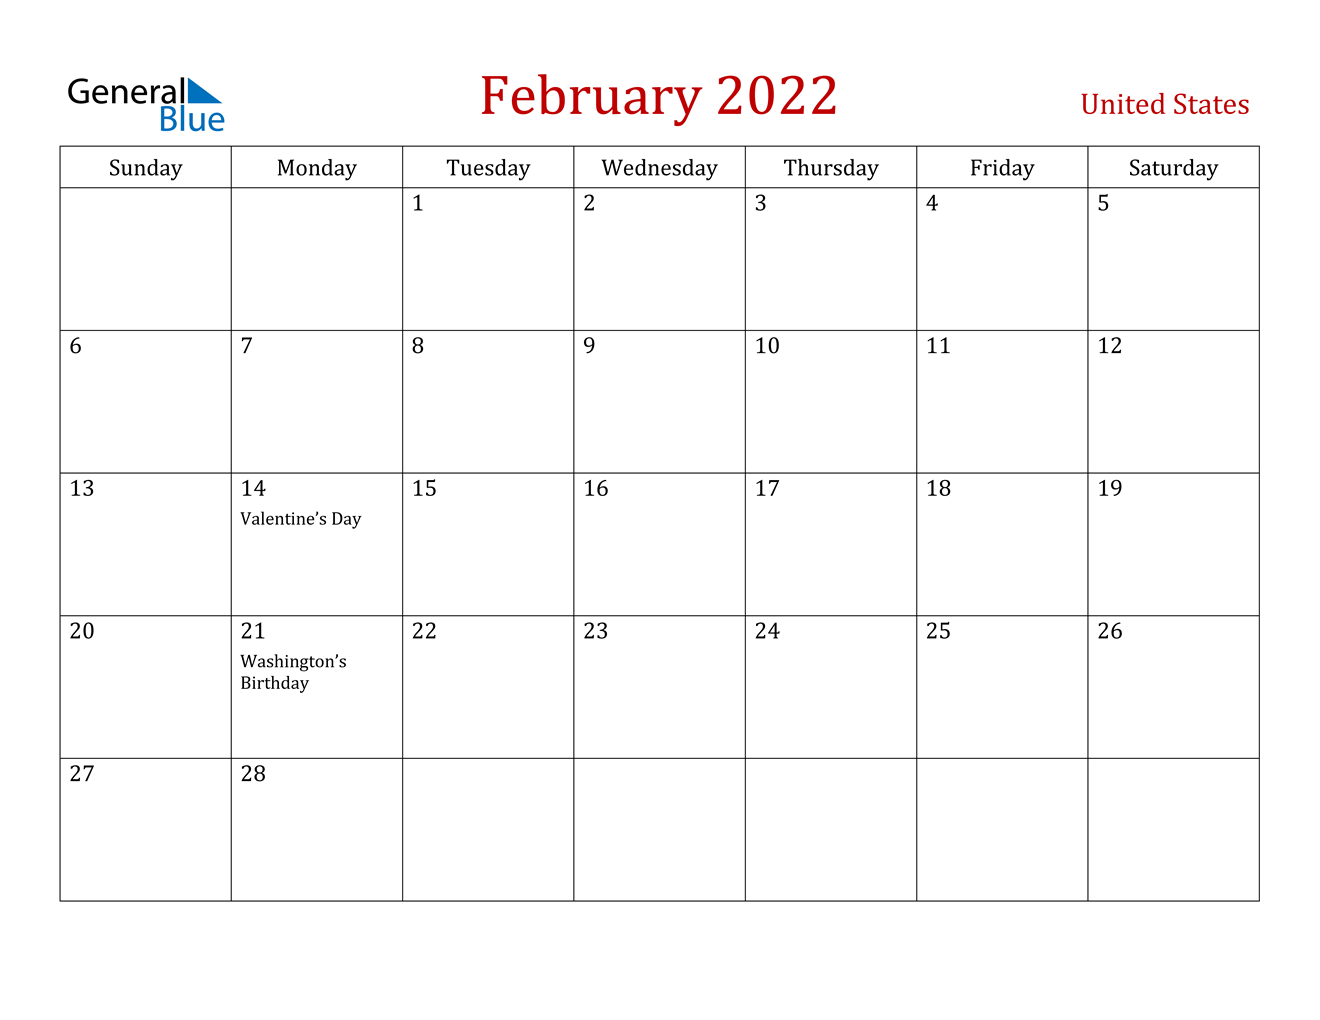 February 2022 Calendar - United States